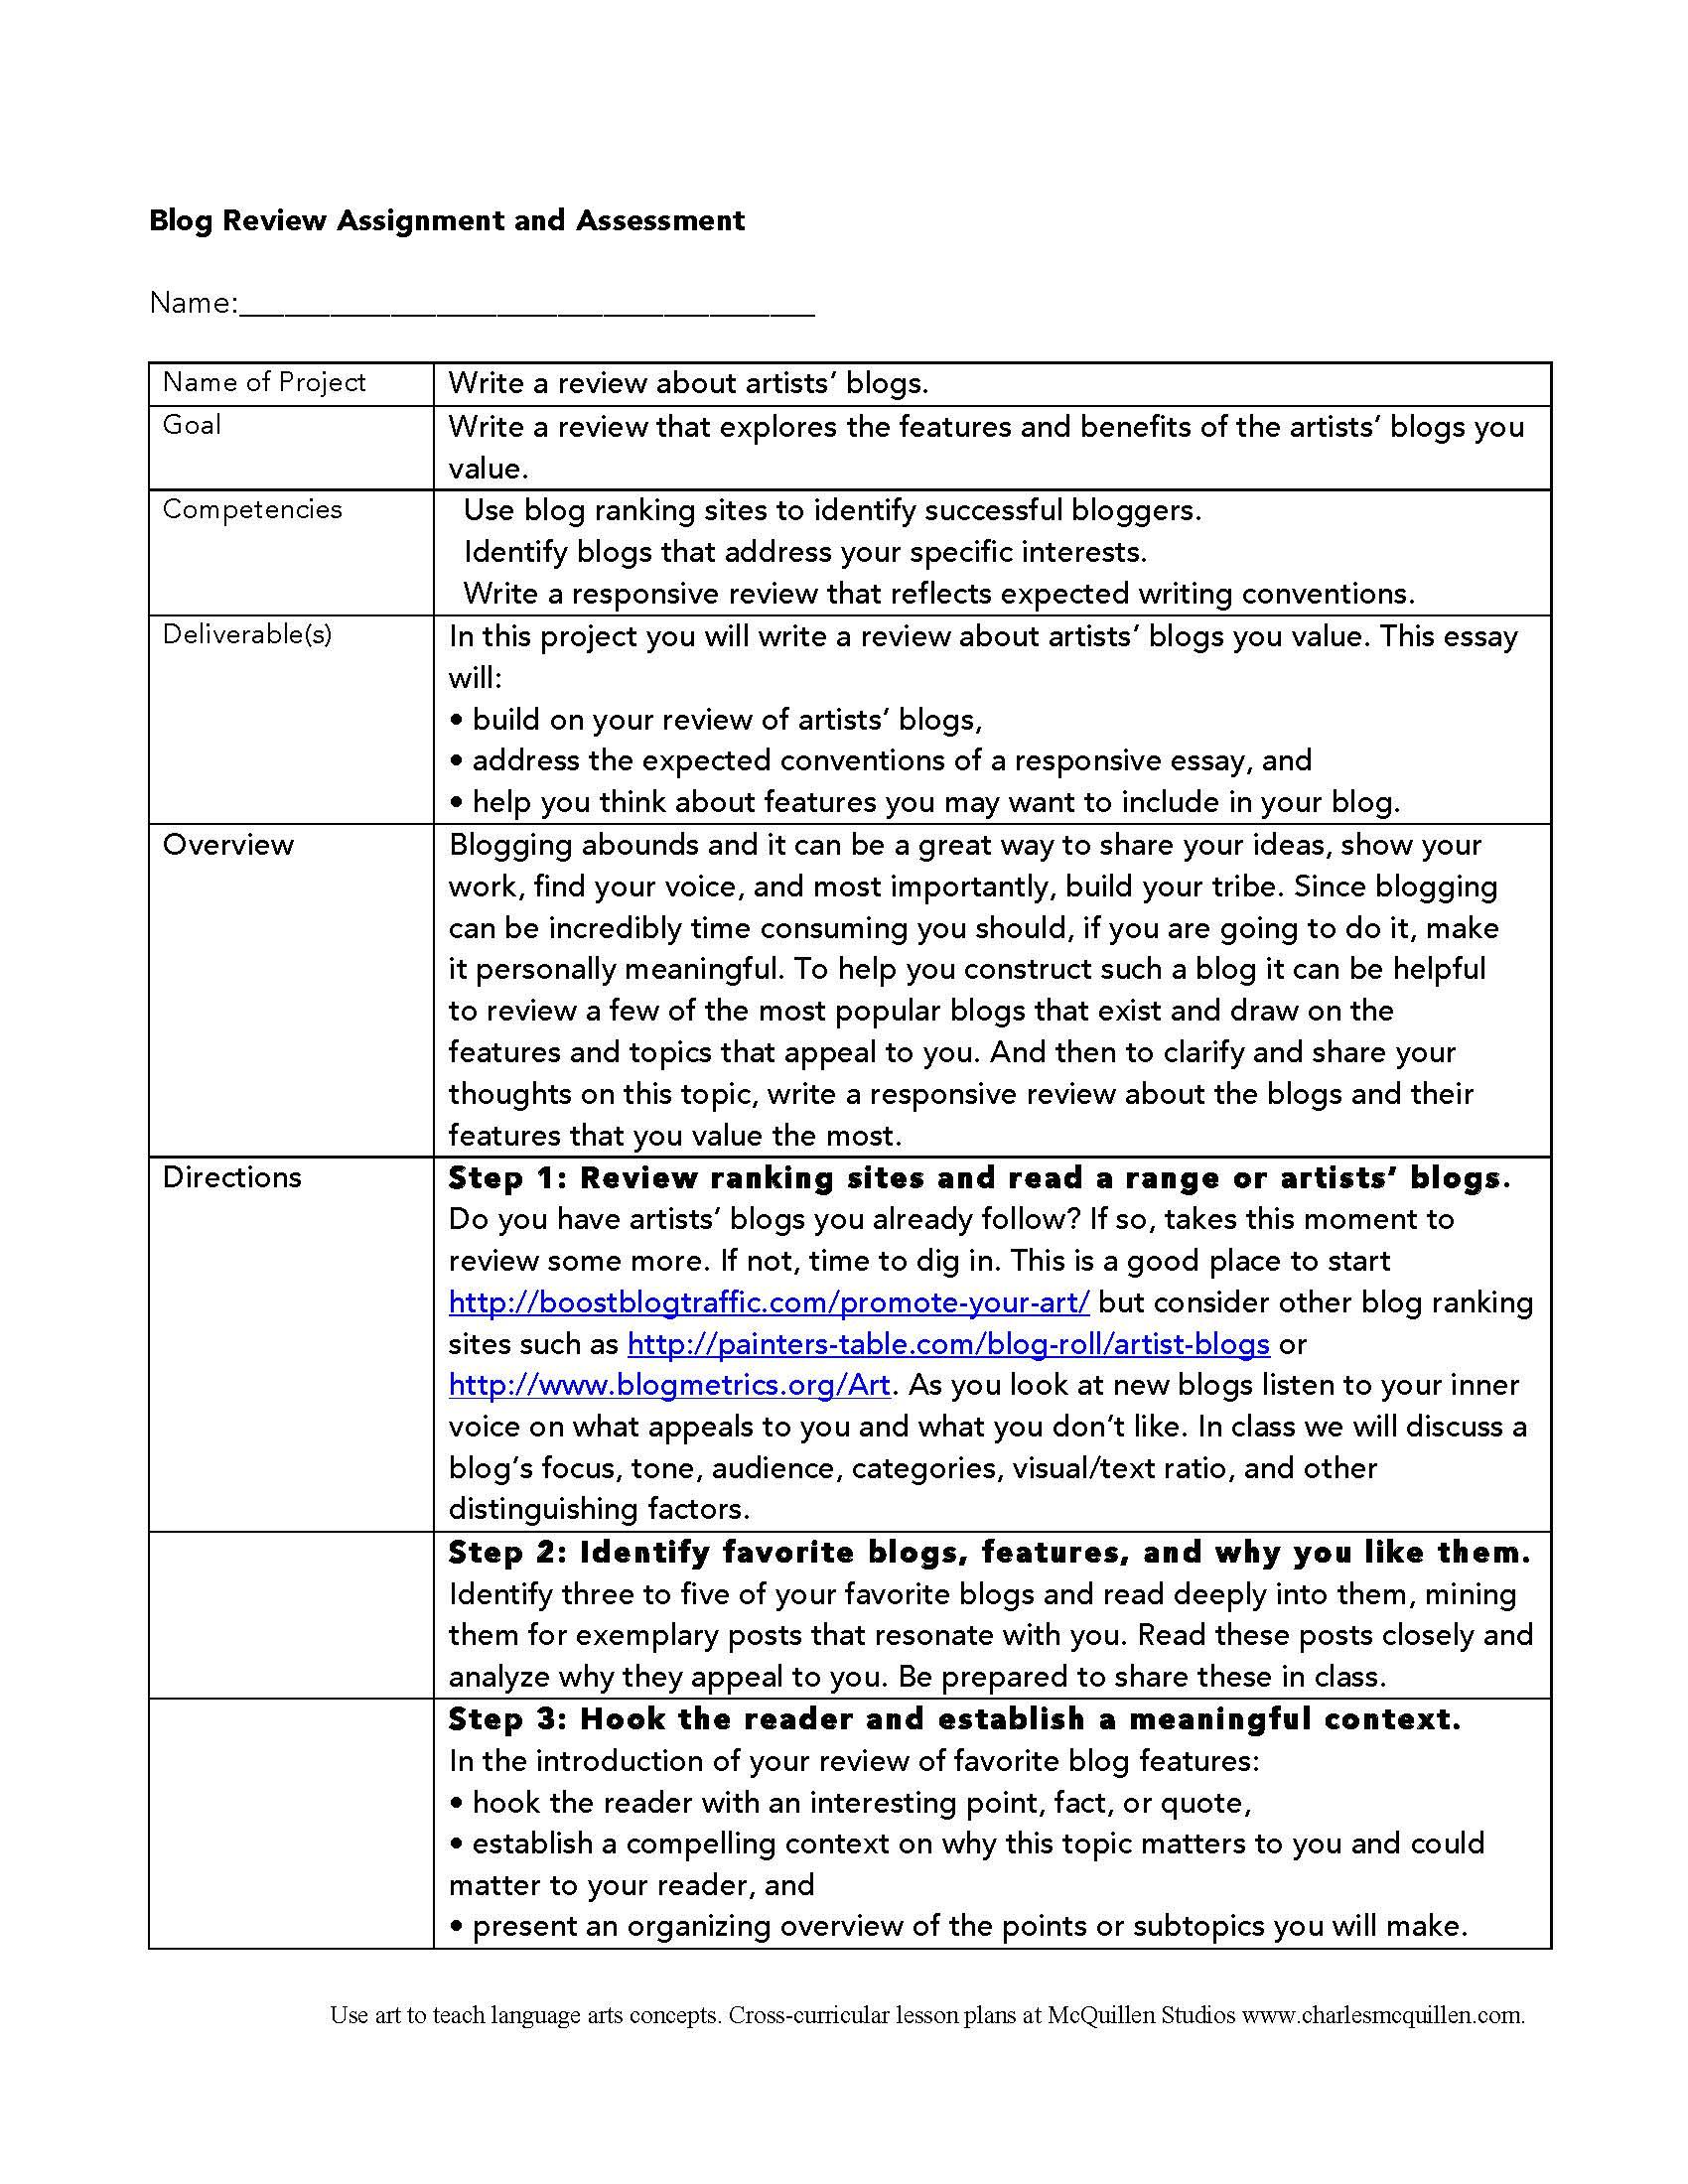 Favorite Blogs Assignment 1